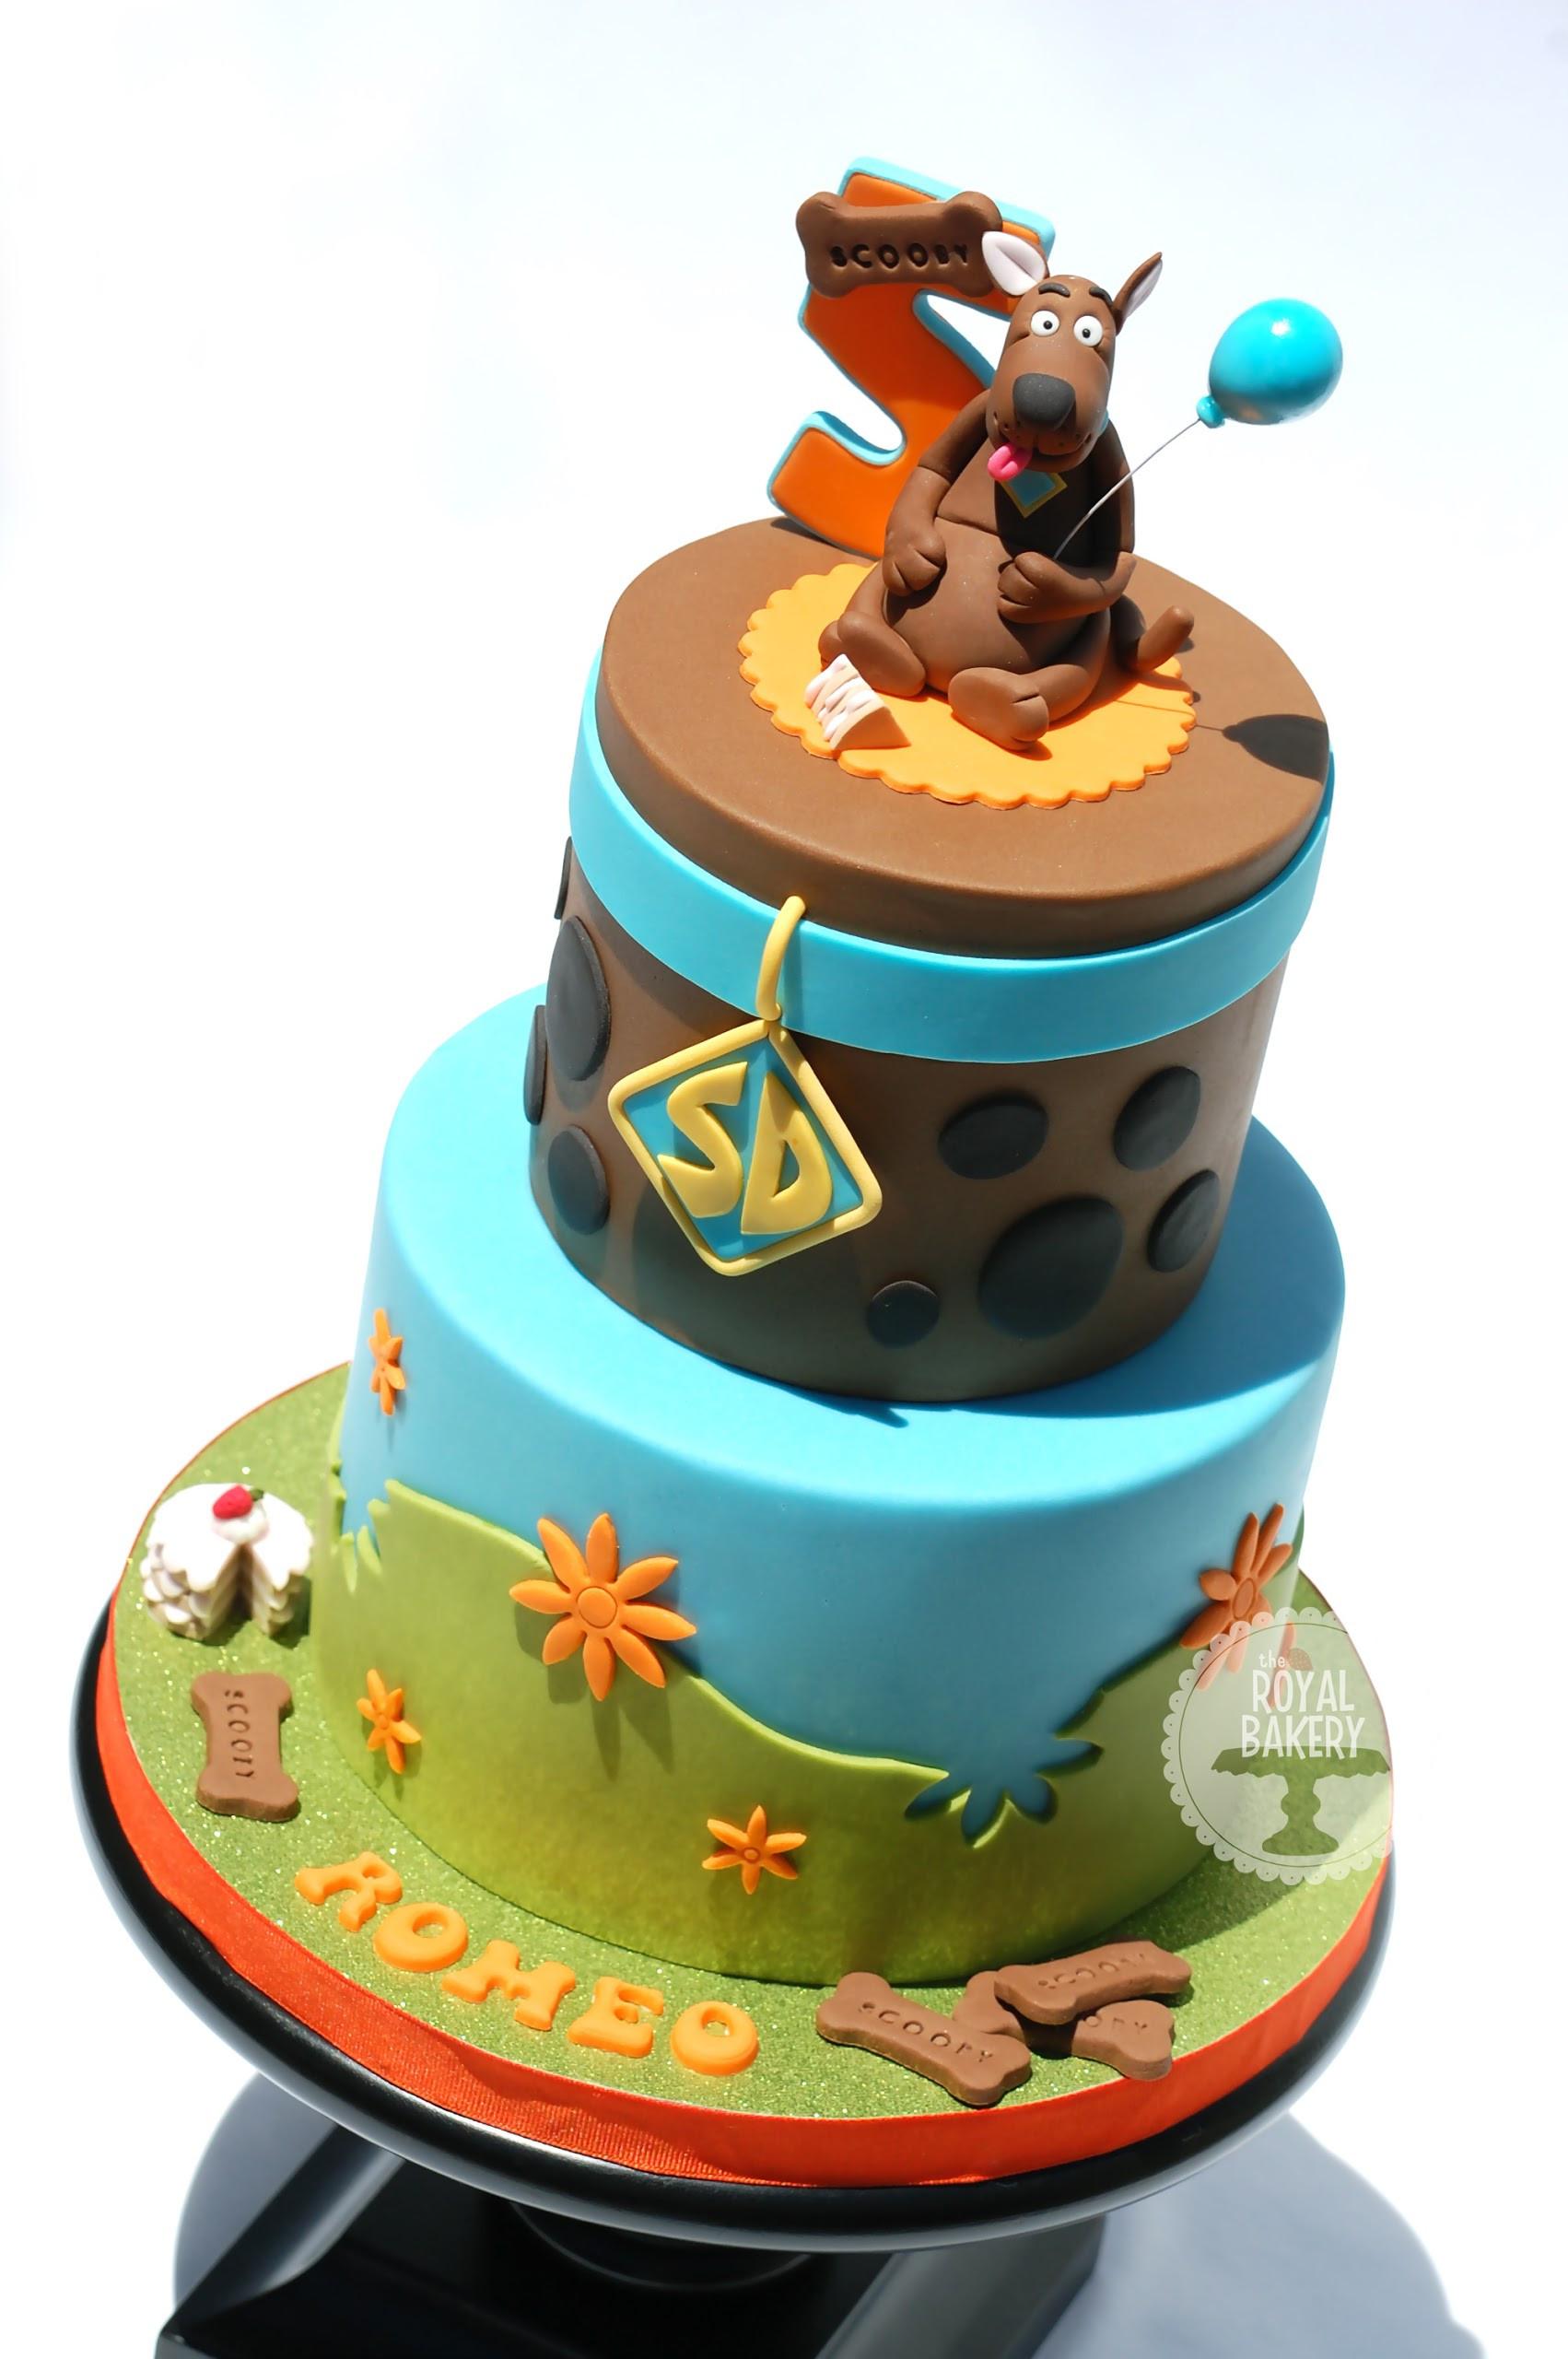 Scooby Doo Birthday Cakes  Scooby Doo Cakes – Decoration Ideas